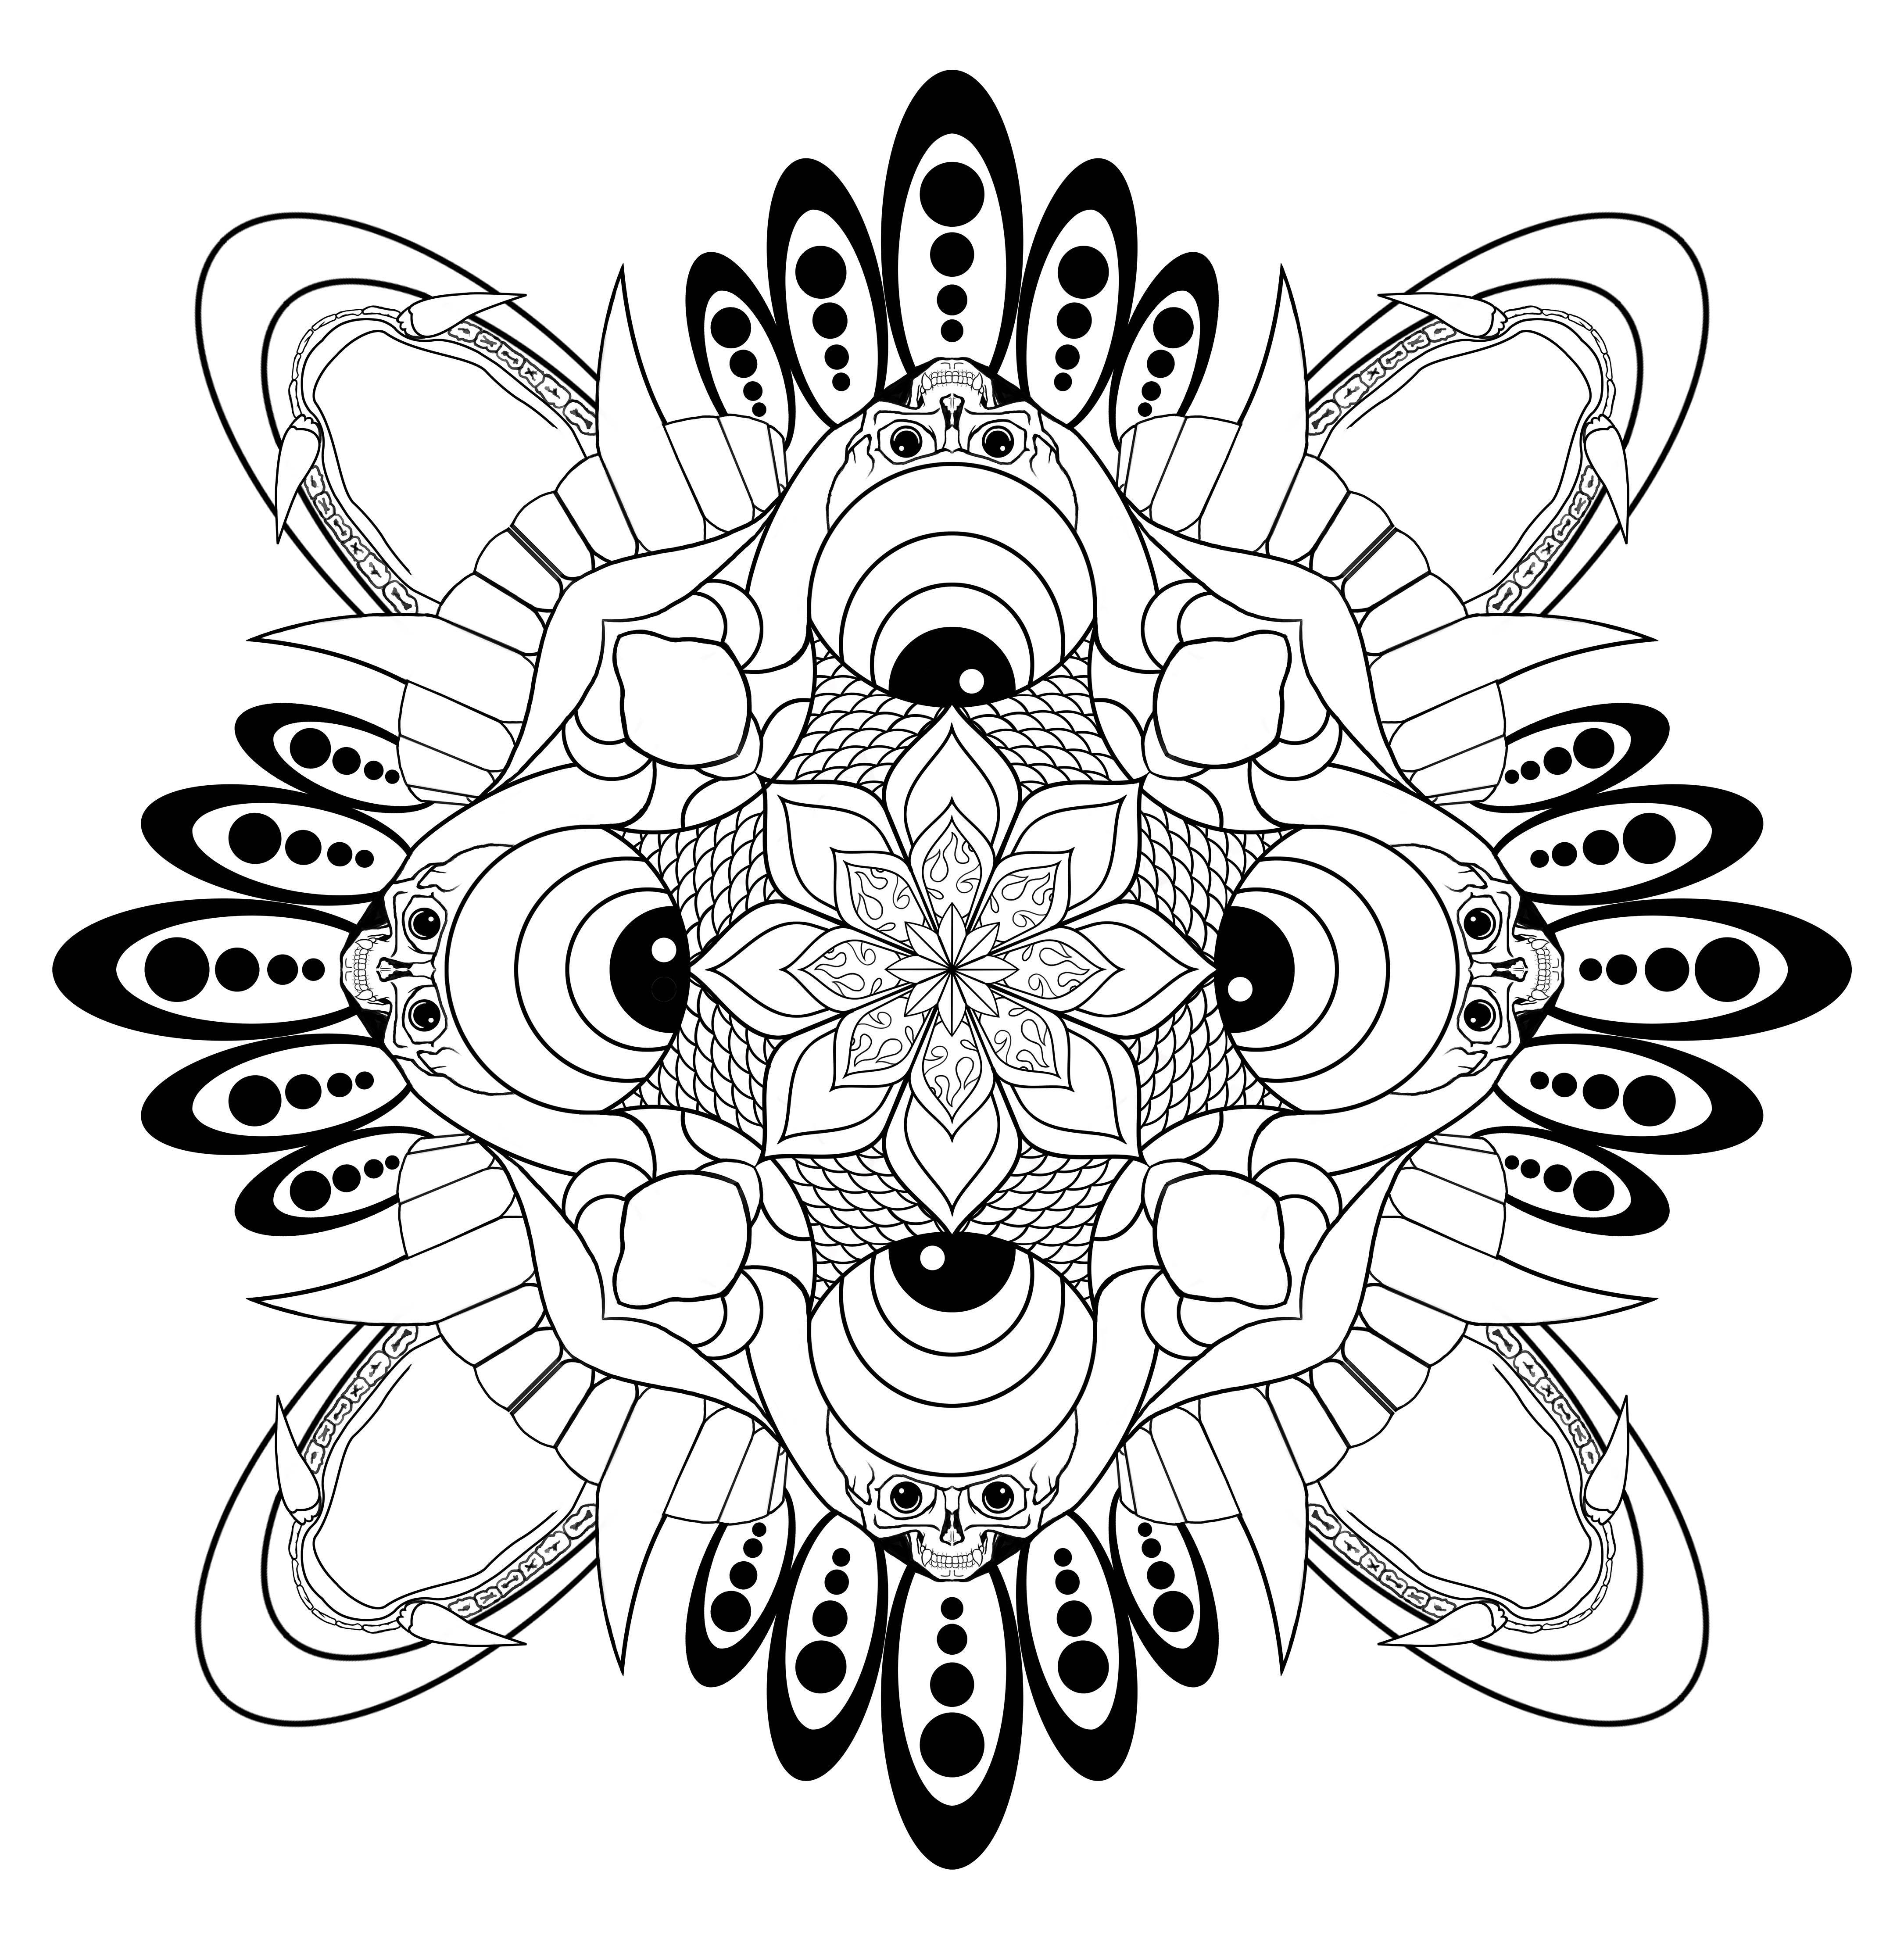 Tibetan style Mandala - image 3 - student project